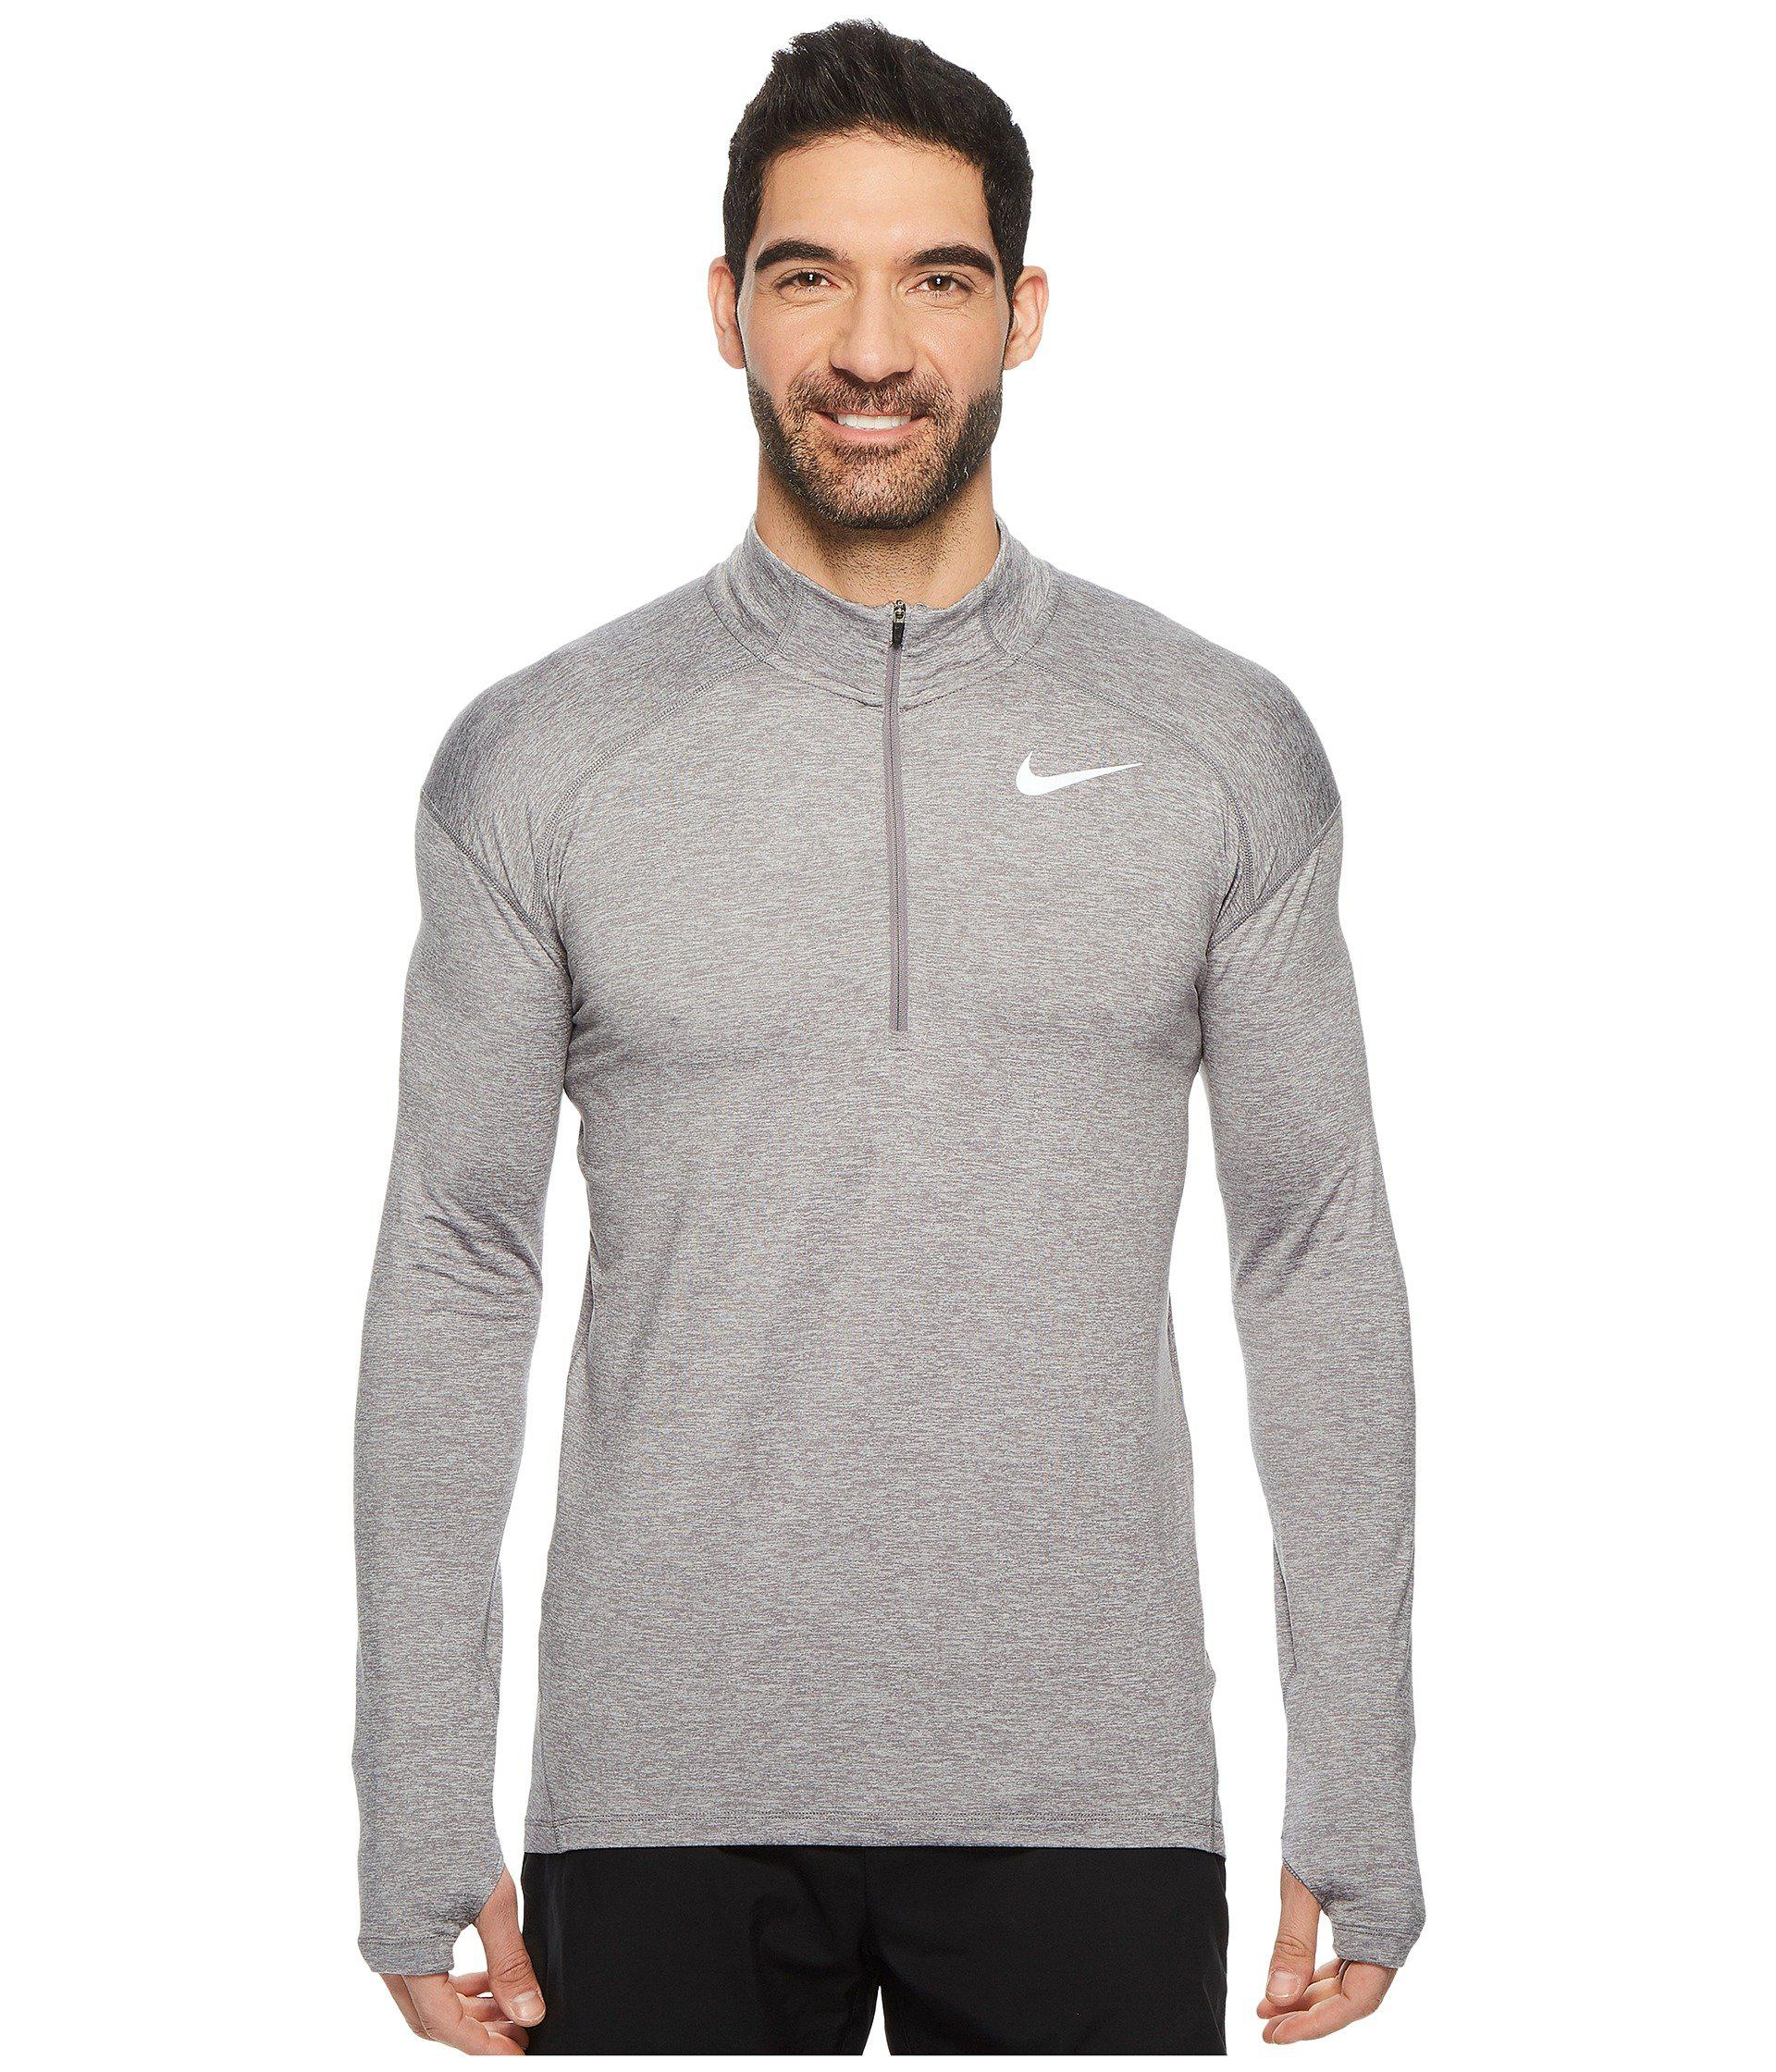 b0b7aa4f1 Nike Dry Element 1/2 Zip Running Top (gunsmoke/atmosphere Grey ...